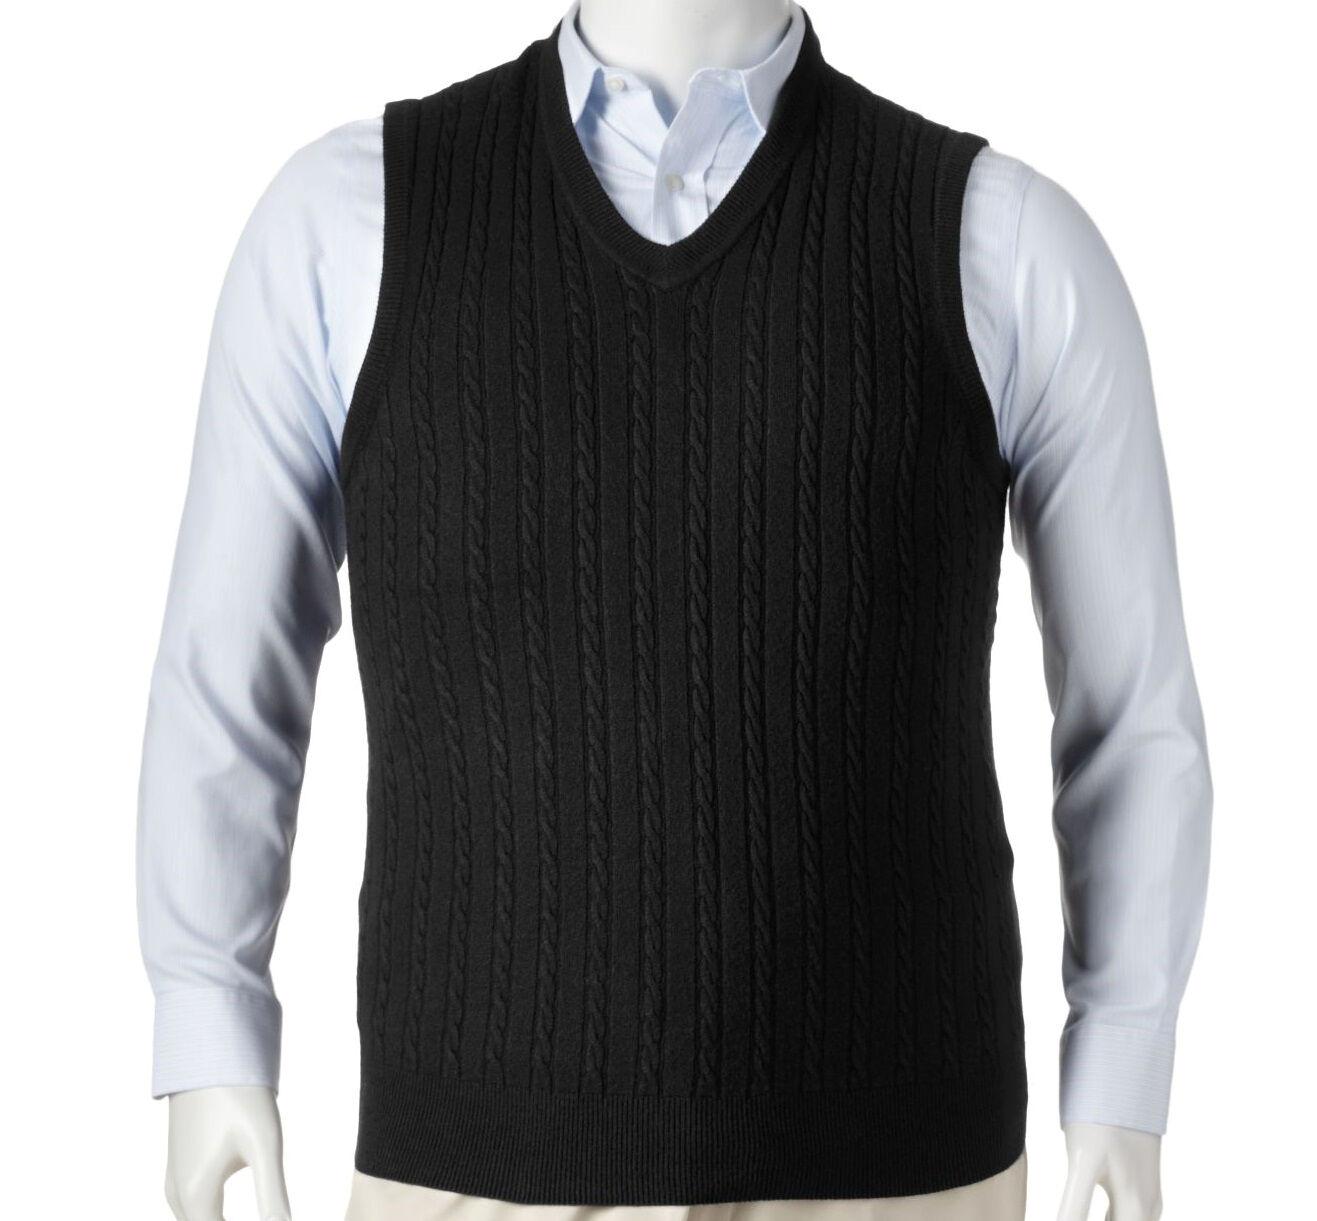 NWT Dockers Black Cable Knit Sweater Vest, Men's L-Tall | eBay